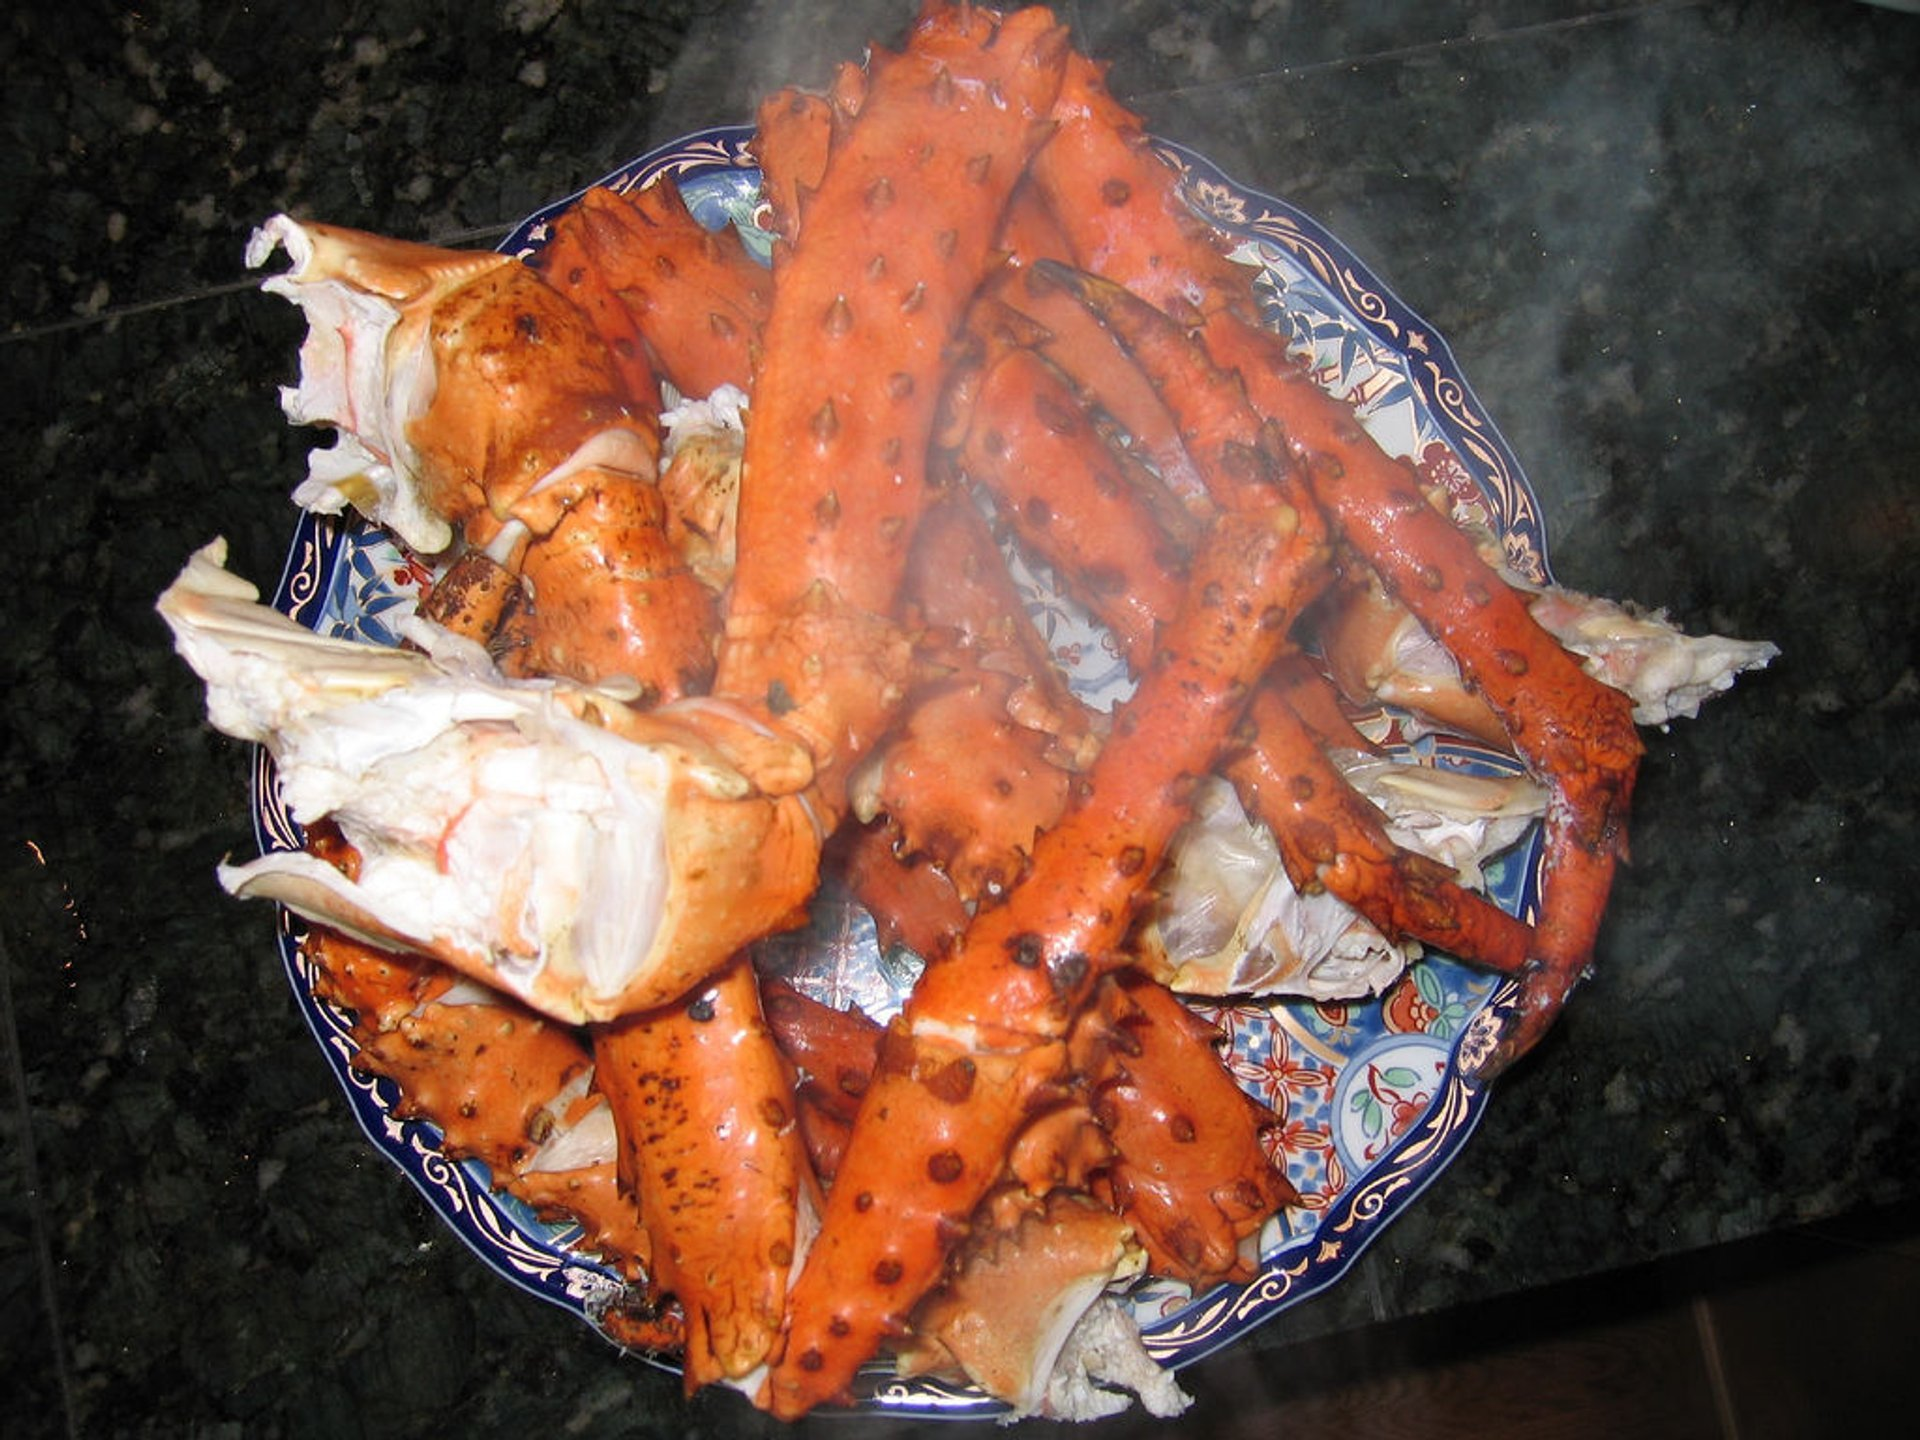 Alaskan King Crab Season in Vancouver - Best Time